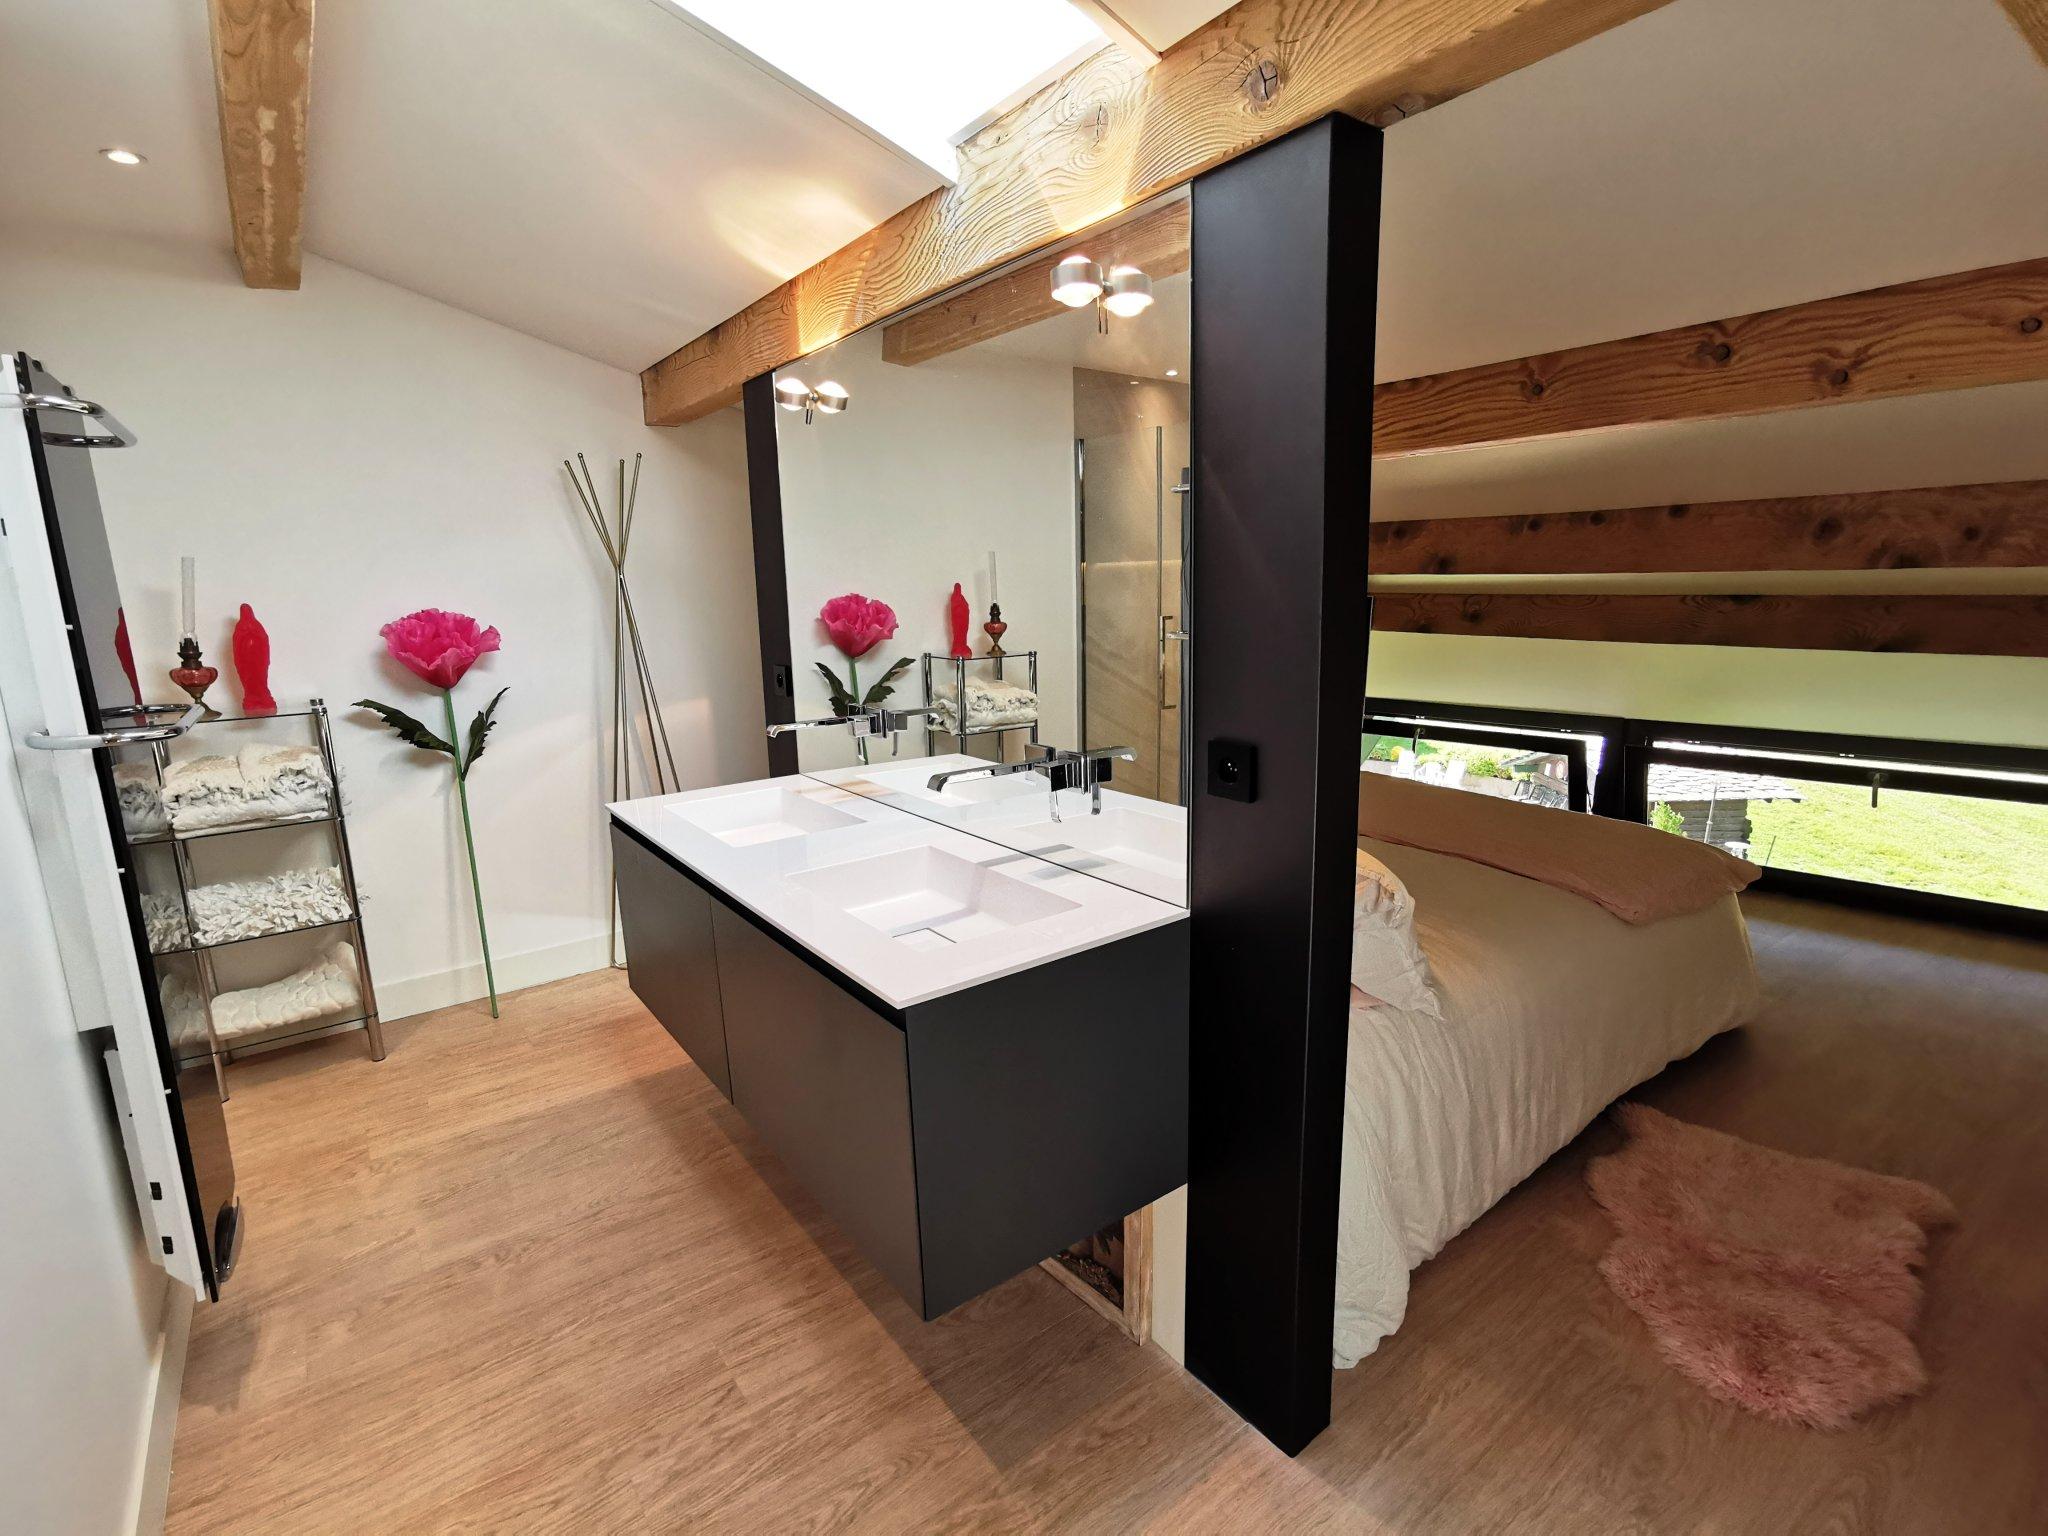 Grizzly Duplex Master Bedroom